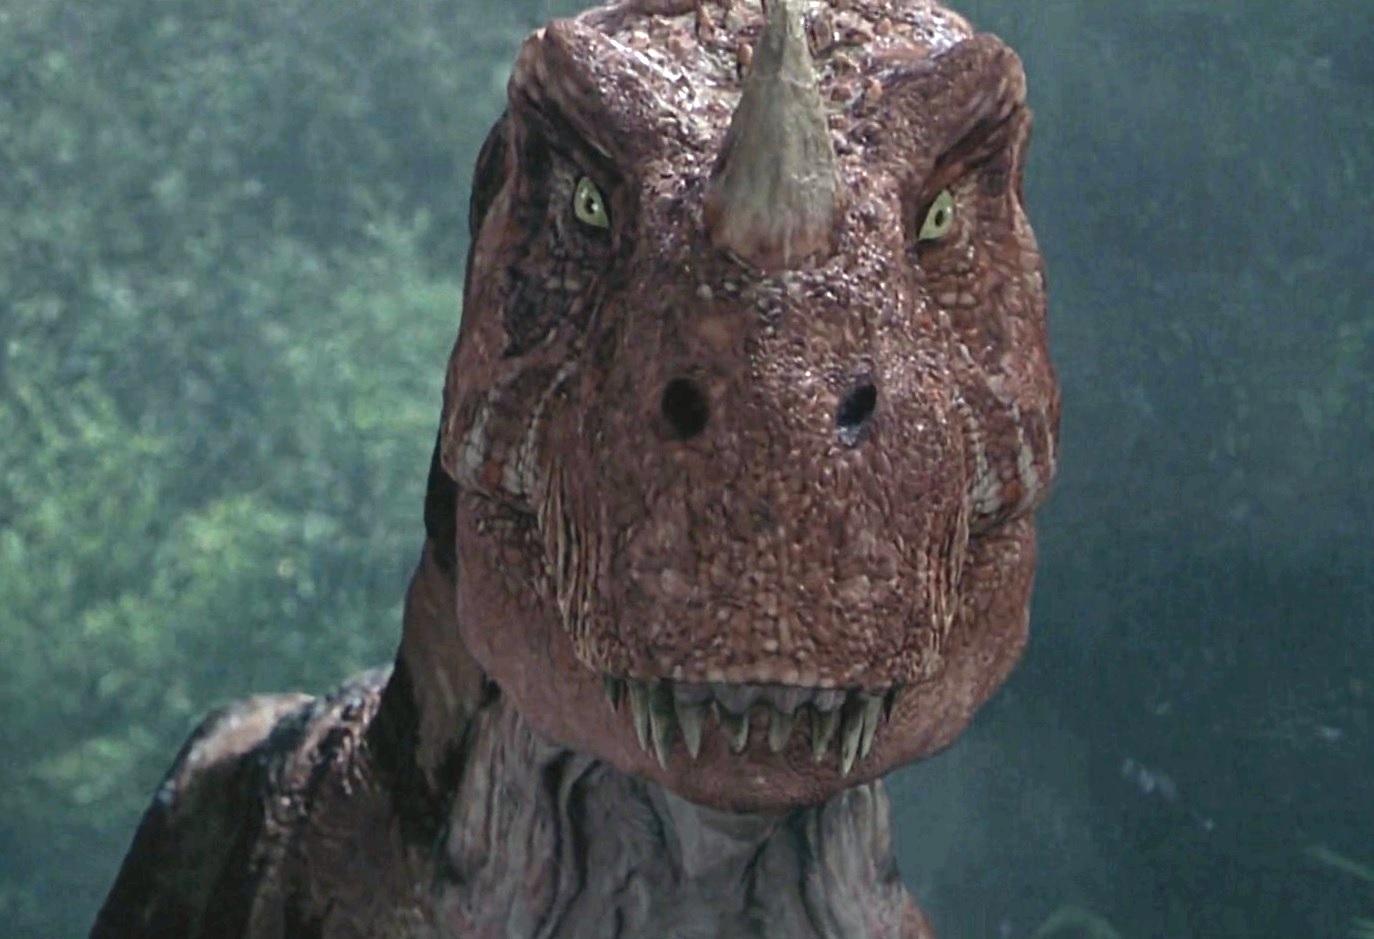 http://4.bp.blogspot.com/-aY0rnbQXFNs/VXiIIl2WjYI/AAAAAAAASg0/G1SOm0vM0EQ/s1600/Dino-Face%2B6.jpg